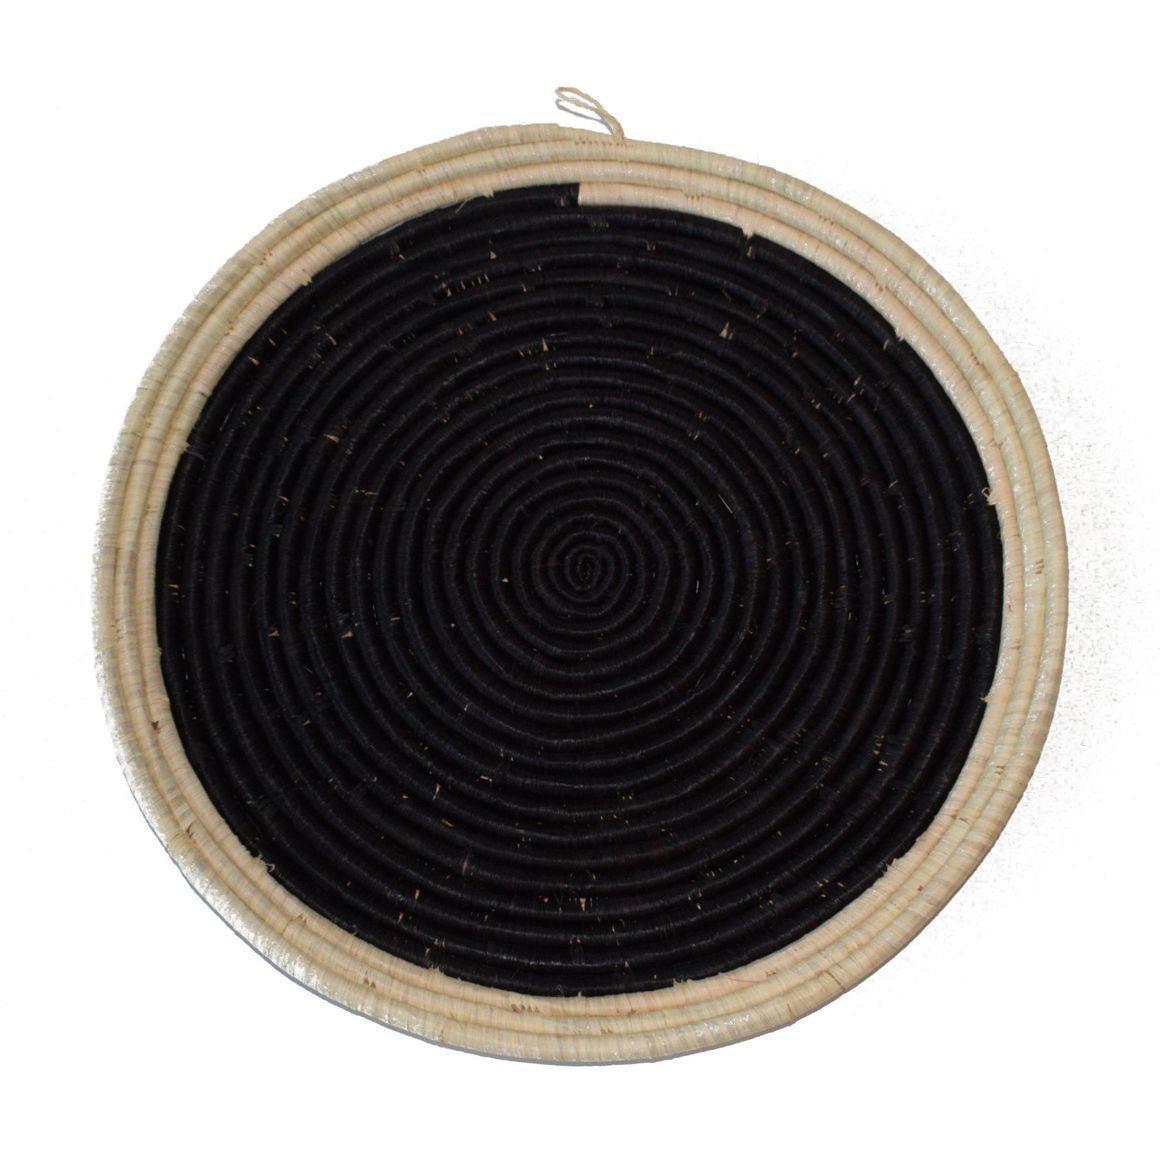 Small 20cm diameter woven bowl - Spot | Trada Marketplace